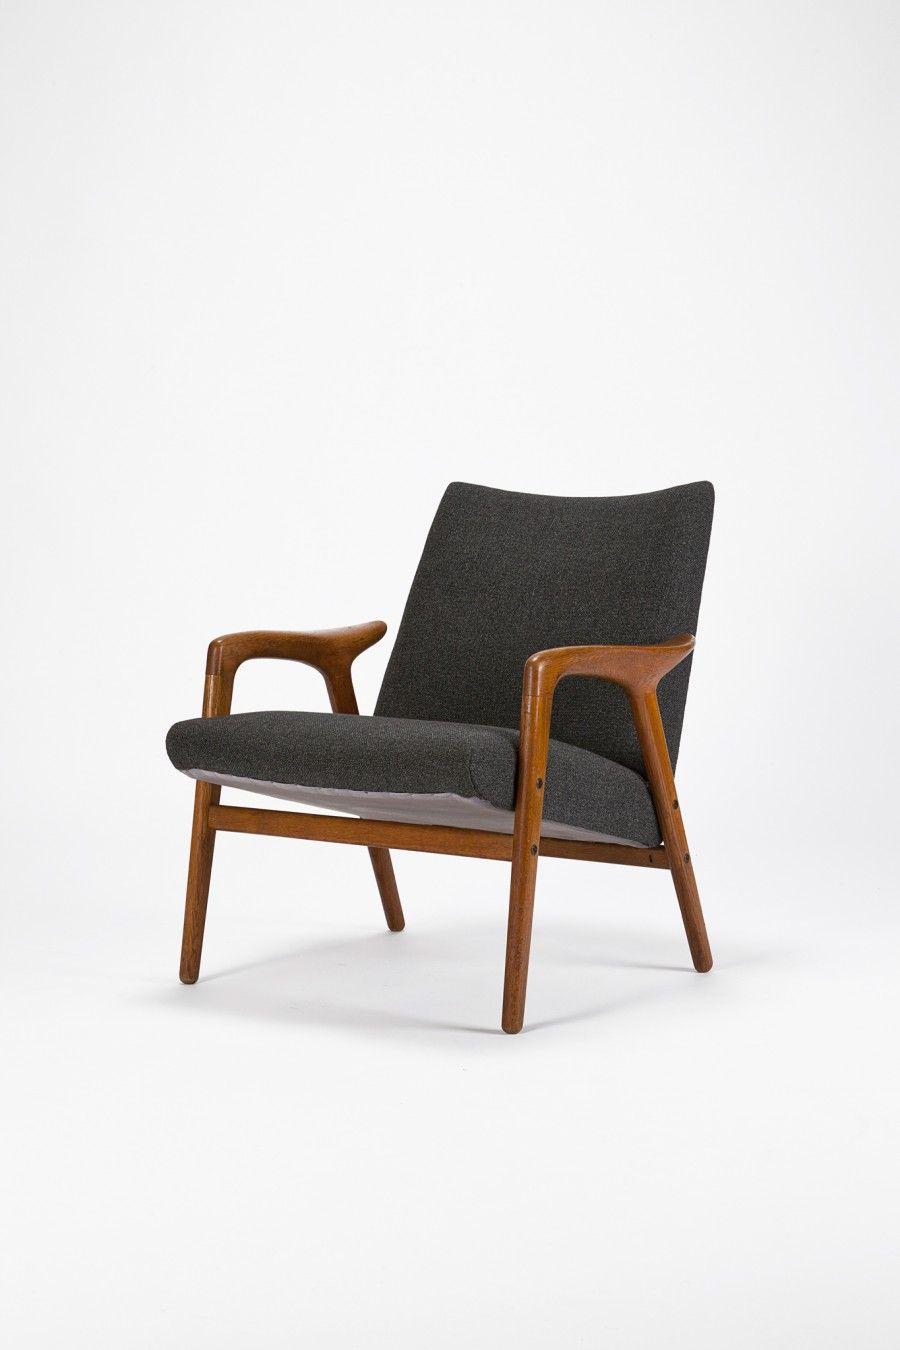 Yngve Ekstr 246 M Oak Easy Chair 1950s Chaired Accent